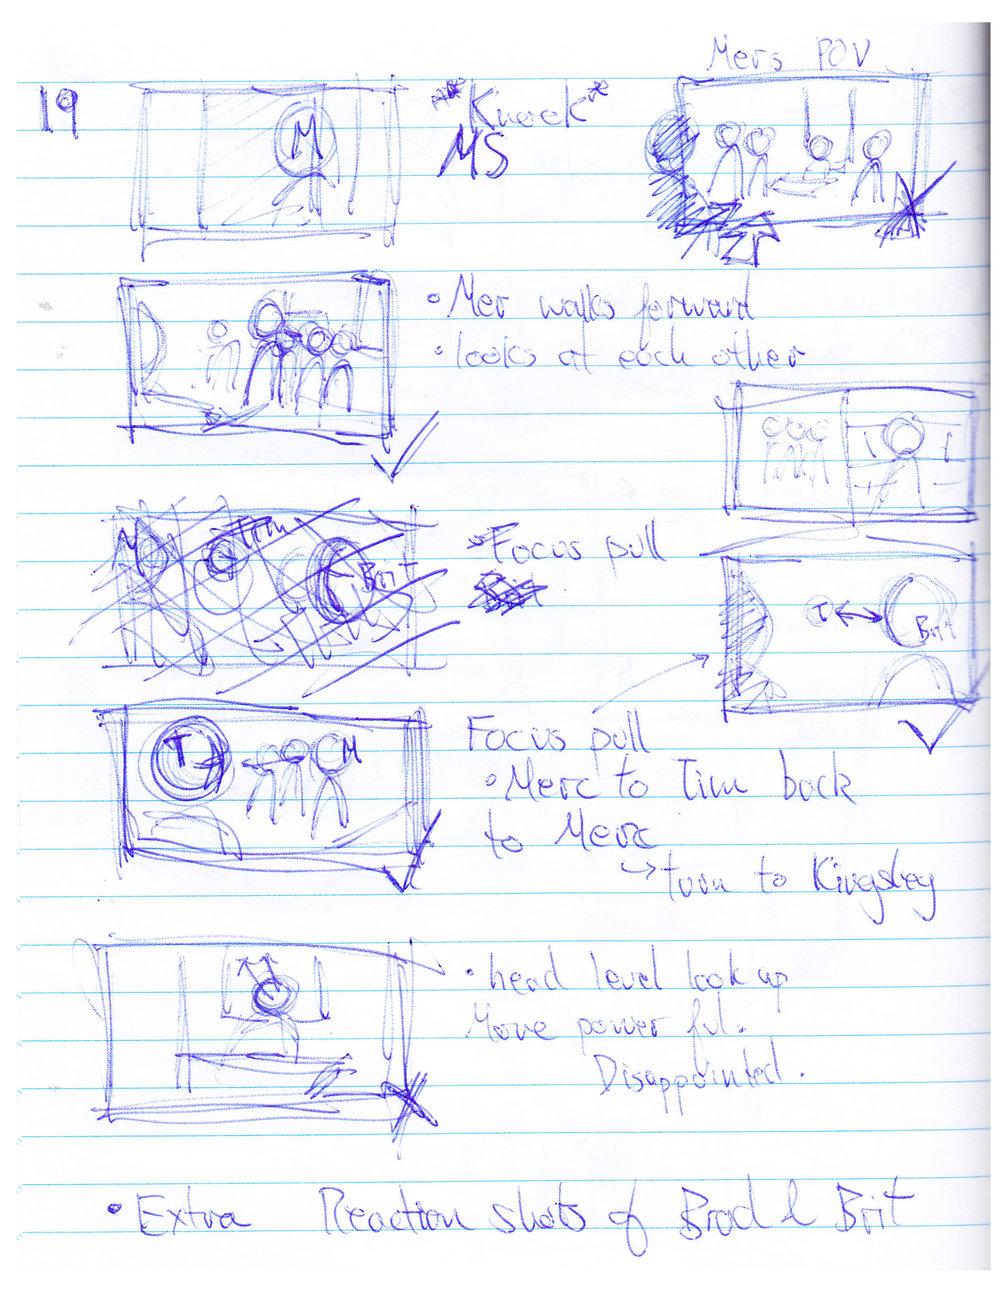 Full page 3 Scene 19